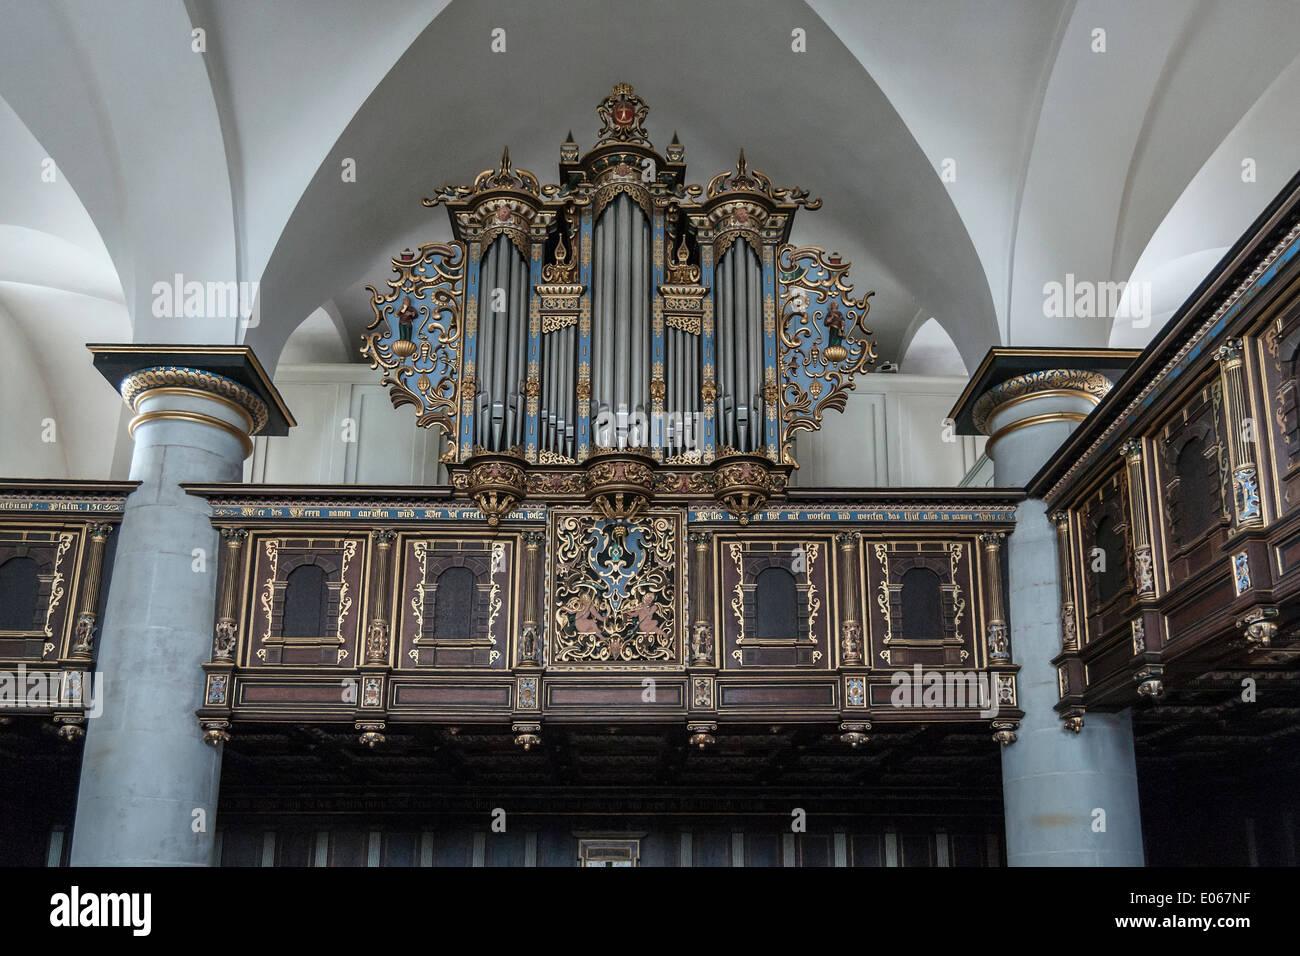 Organ pipes, Kronborg Castle chapel,  Helsingnor, Denmark - Stock Image